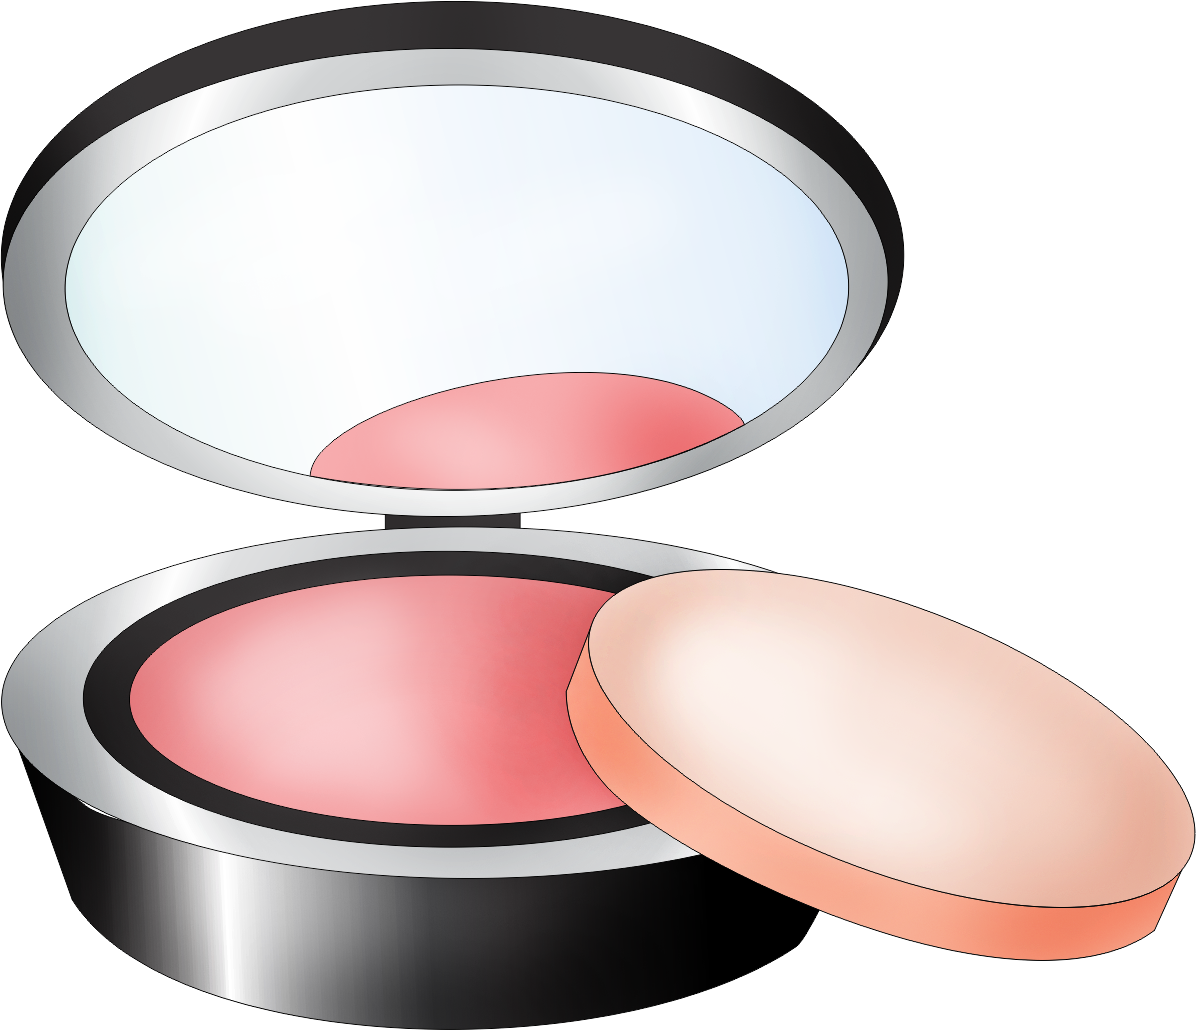 Cosmetology Clipart Cute Makeup Cosmetology Cute Makeup